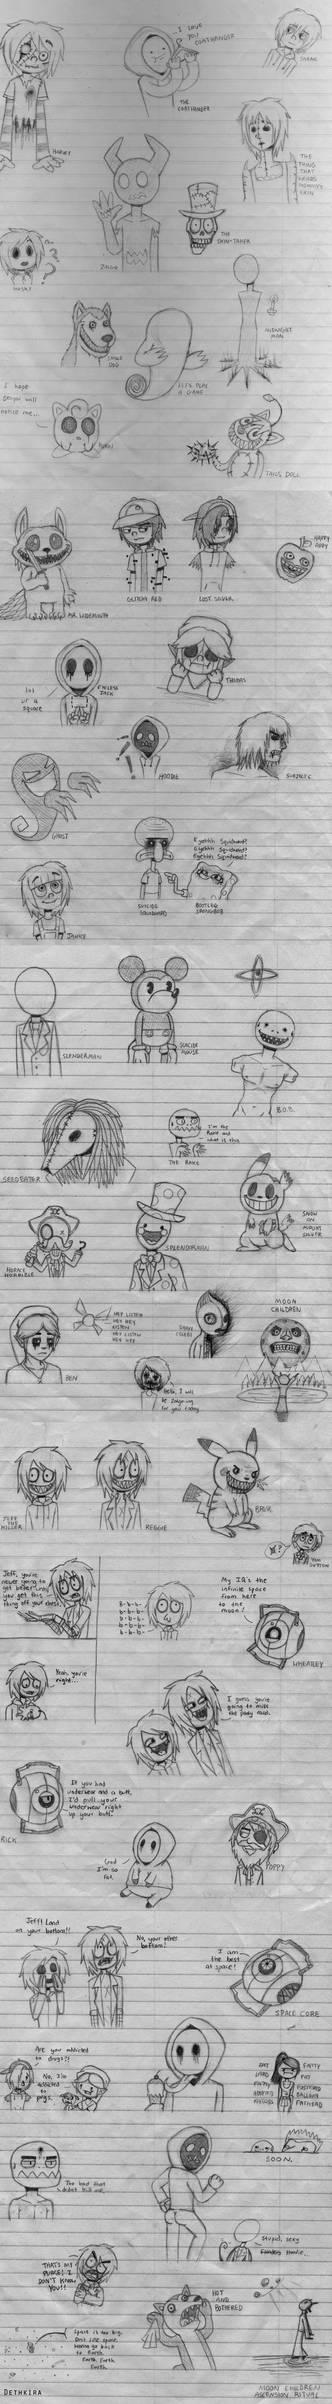 Creepypasta Sketch Dump